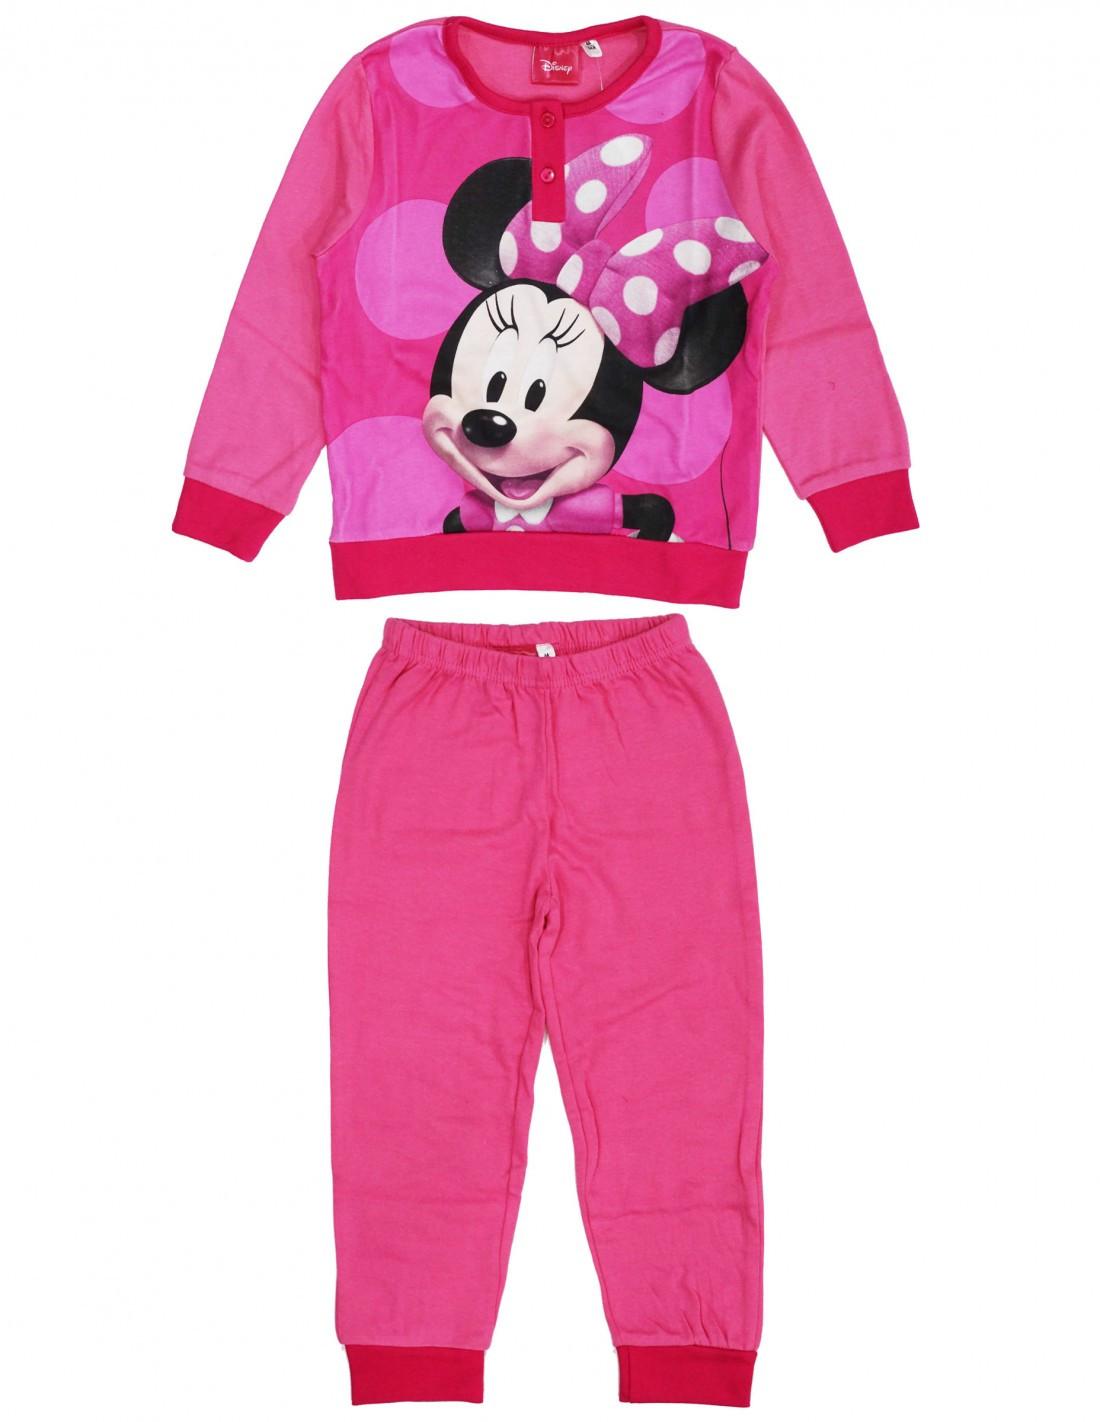 Pigiama Disney Minnie - Rosa 6 Anni